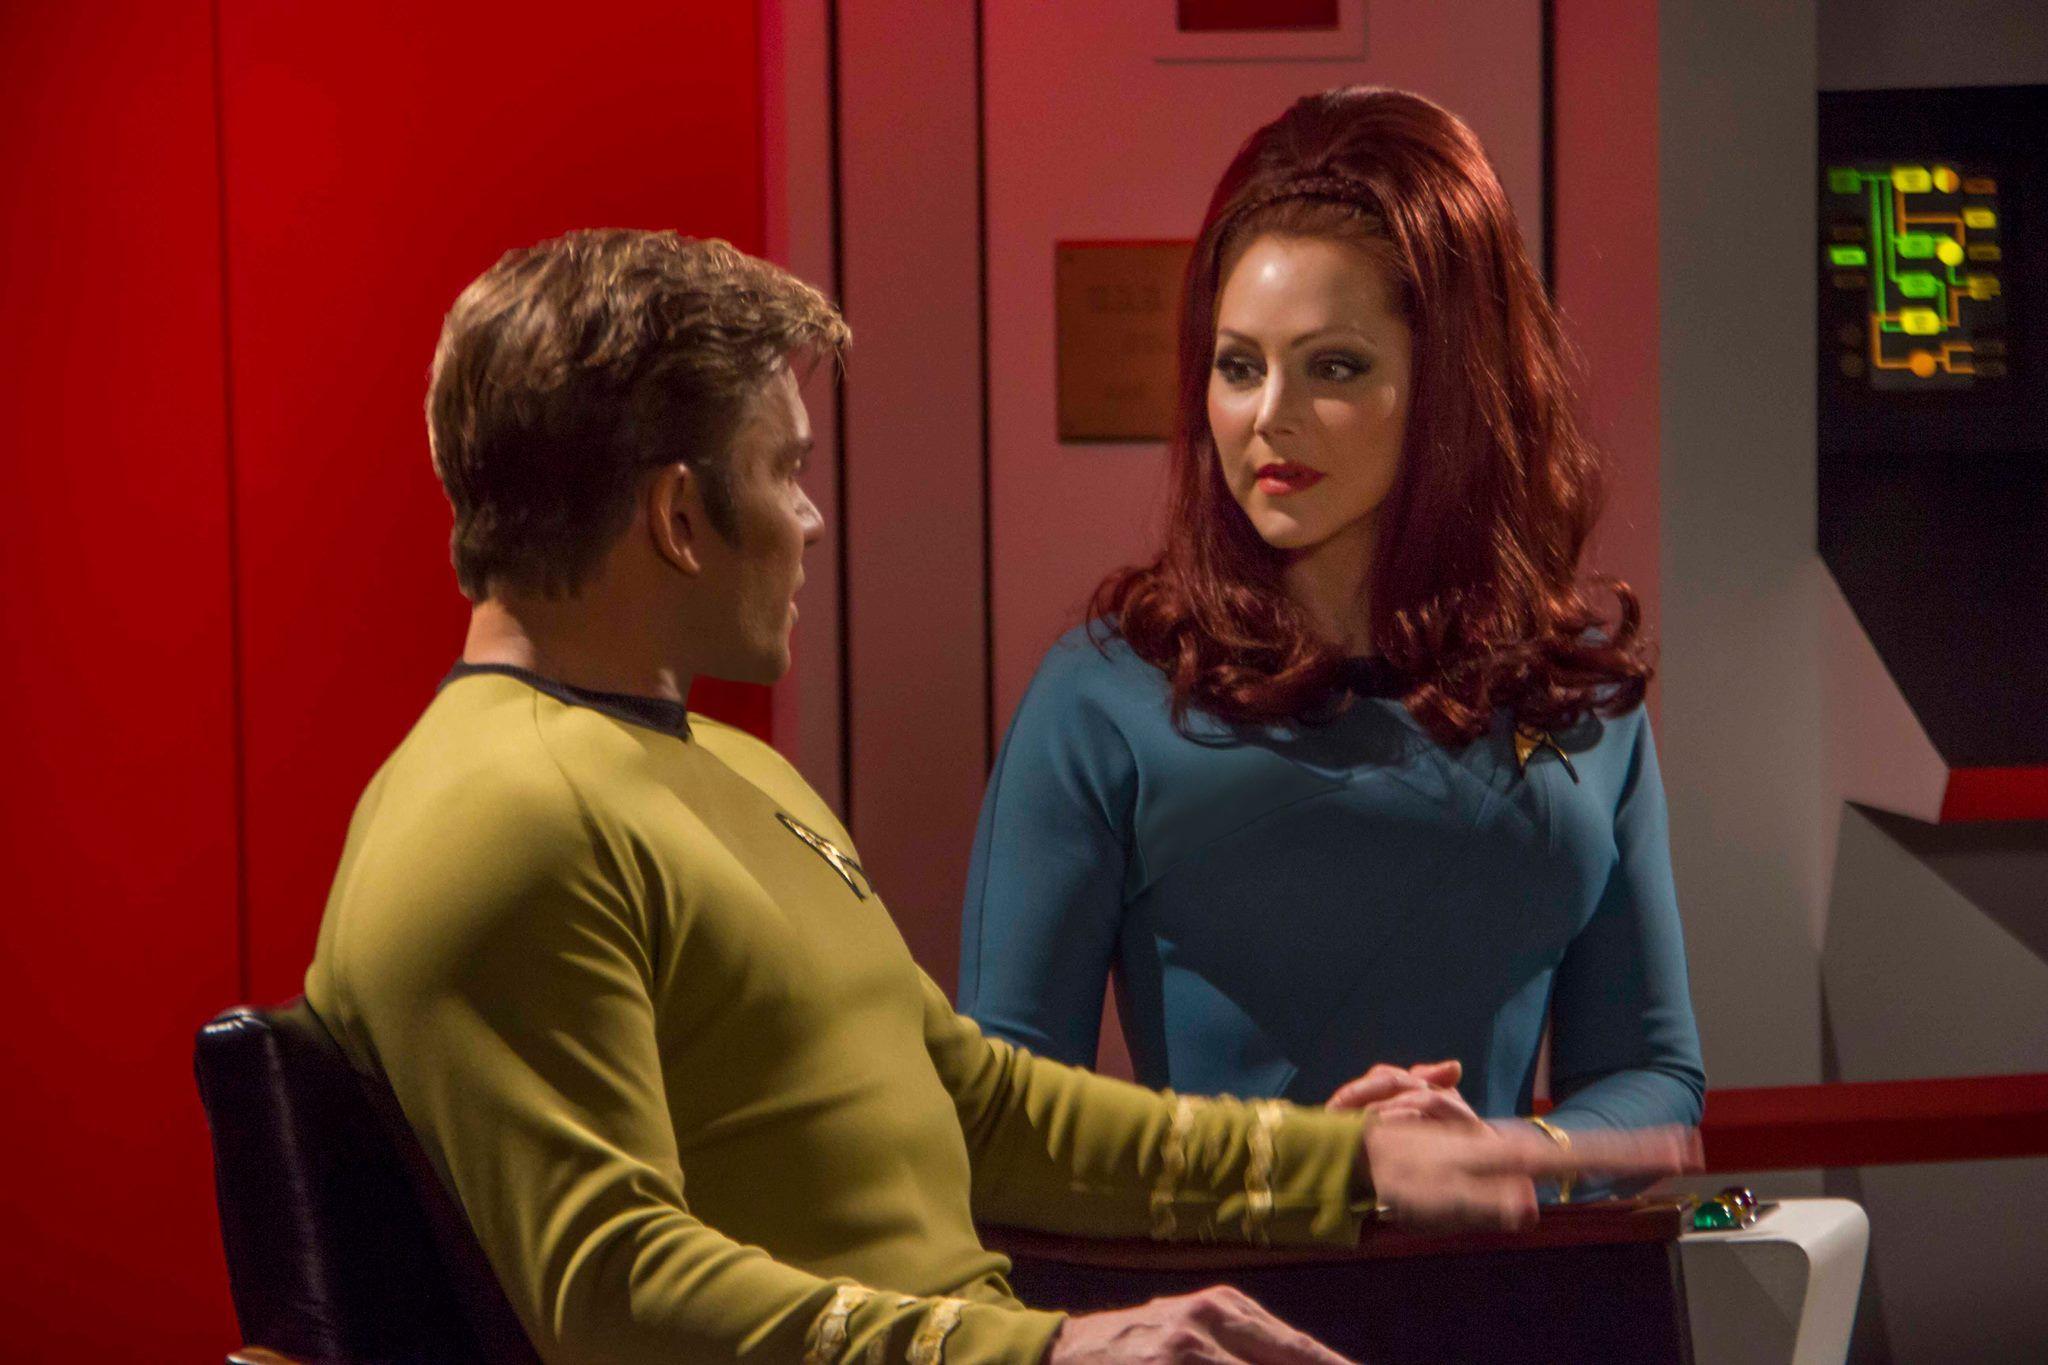 Captain Kirk & Dr. McKennah (Vic Mignogna & Michele Specht), Star Trek Continues https://www.facebook.com/StarTrekContinues